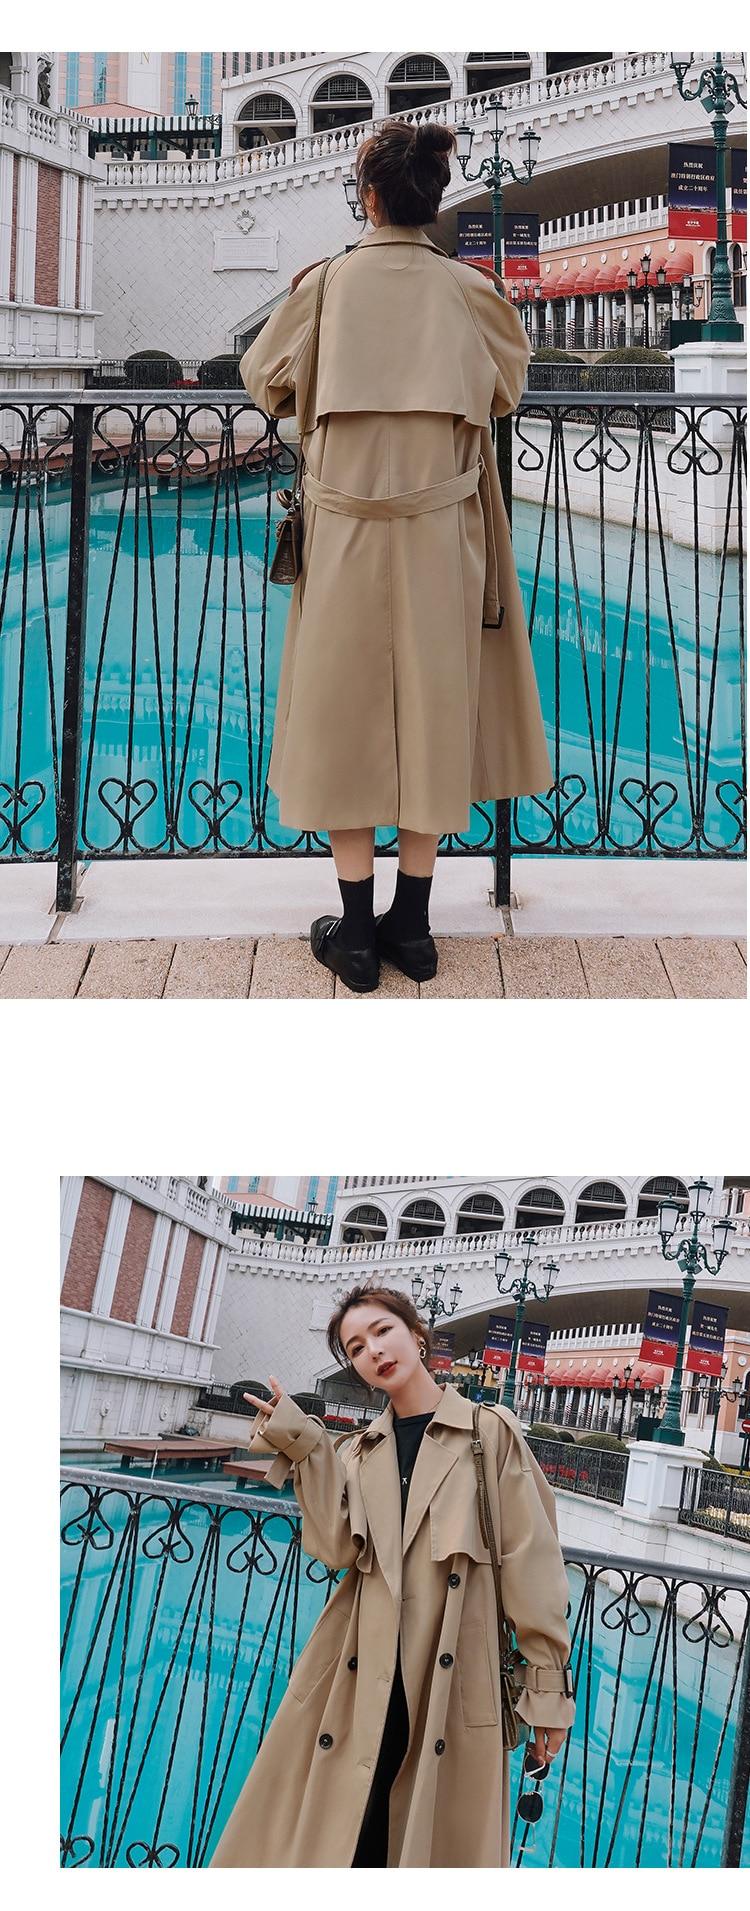 Hea87da54dafd4869beebf1c3644794dcX 2021 Autumn Women Trench Coat With Belt Women Clothes Blue Coat Casaco Feminino Harajuku Abrigo Mujer Long Trench Femme